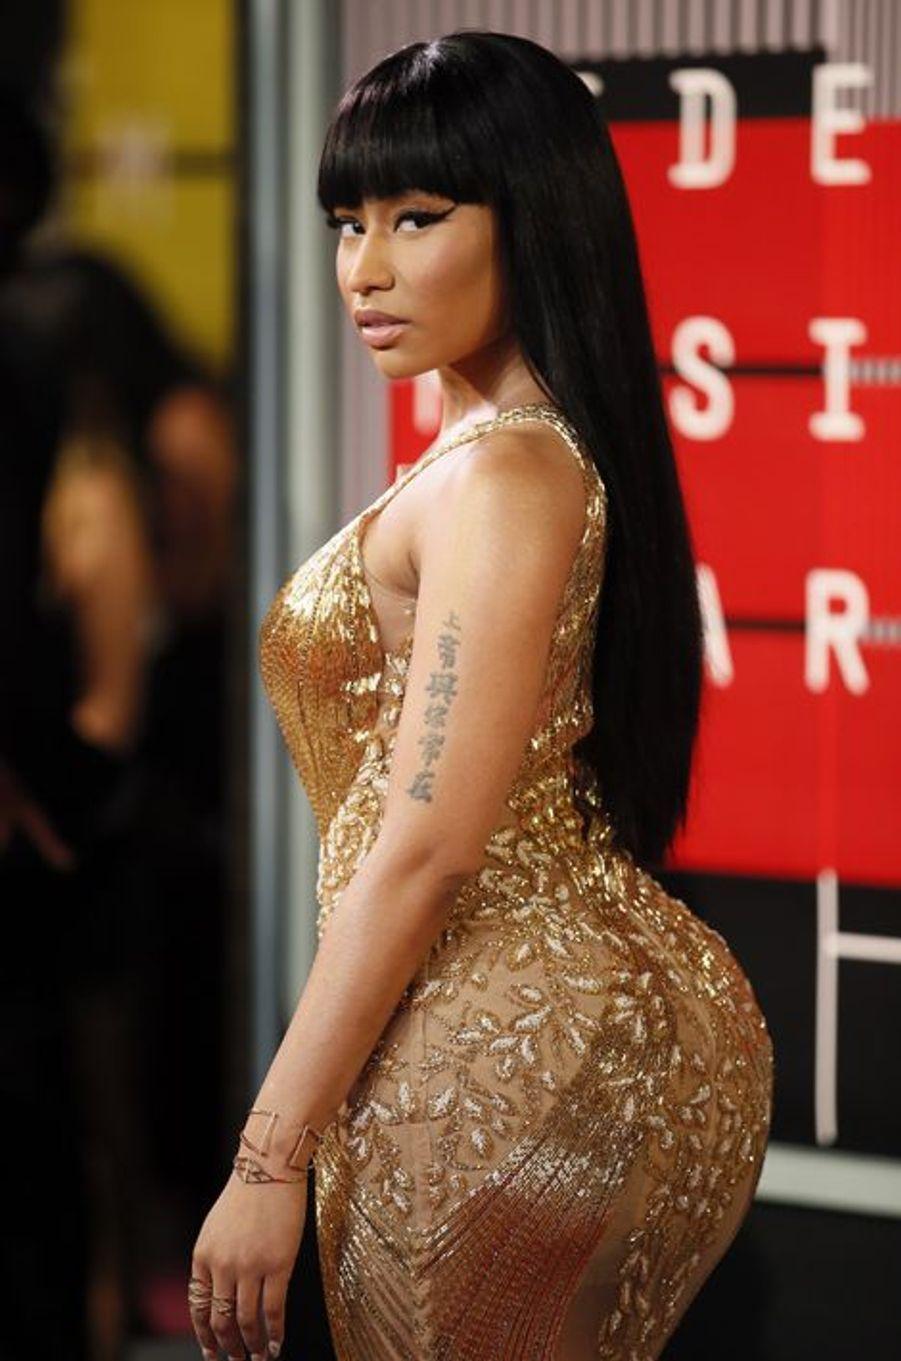 La chanteuse Nicki Minaj arrive aux MTV Video Music Awards 2015 dimanche soir.